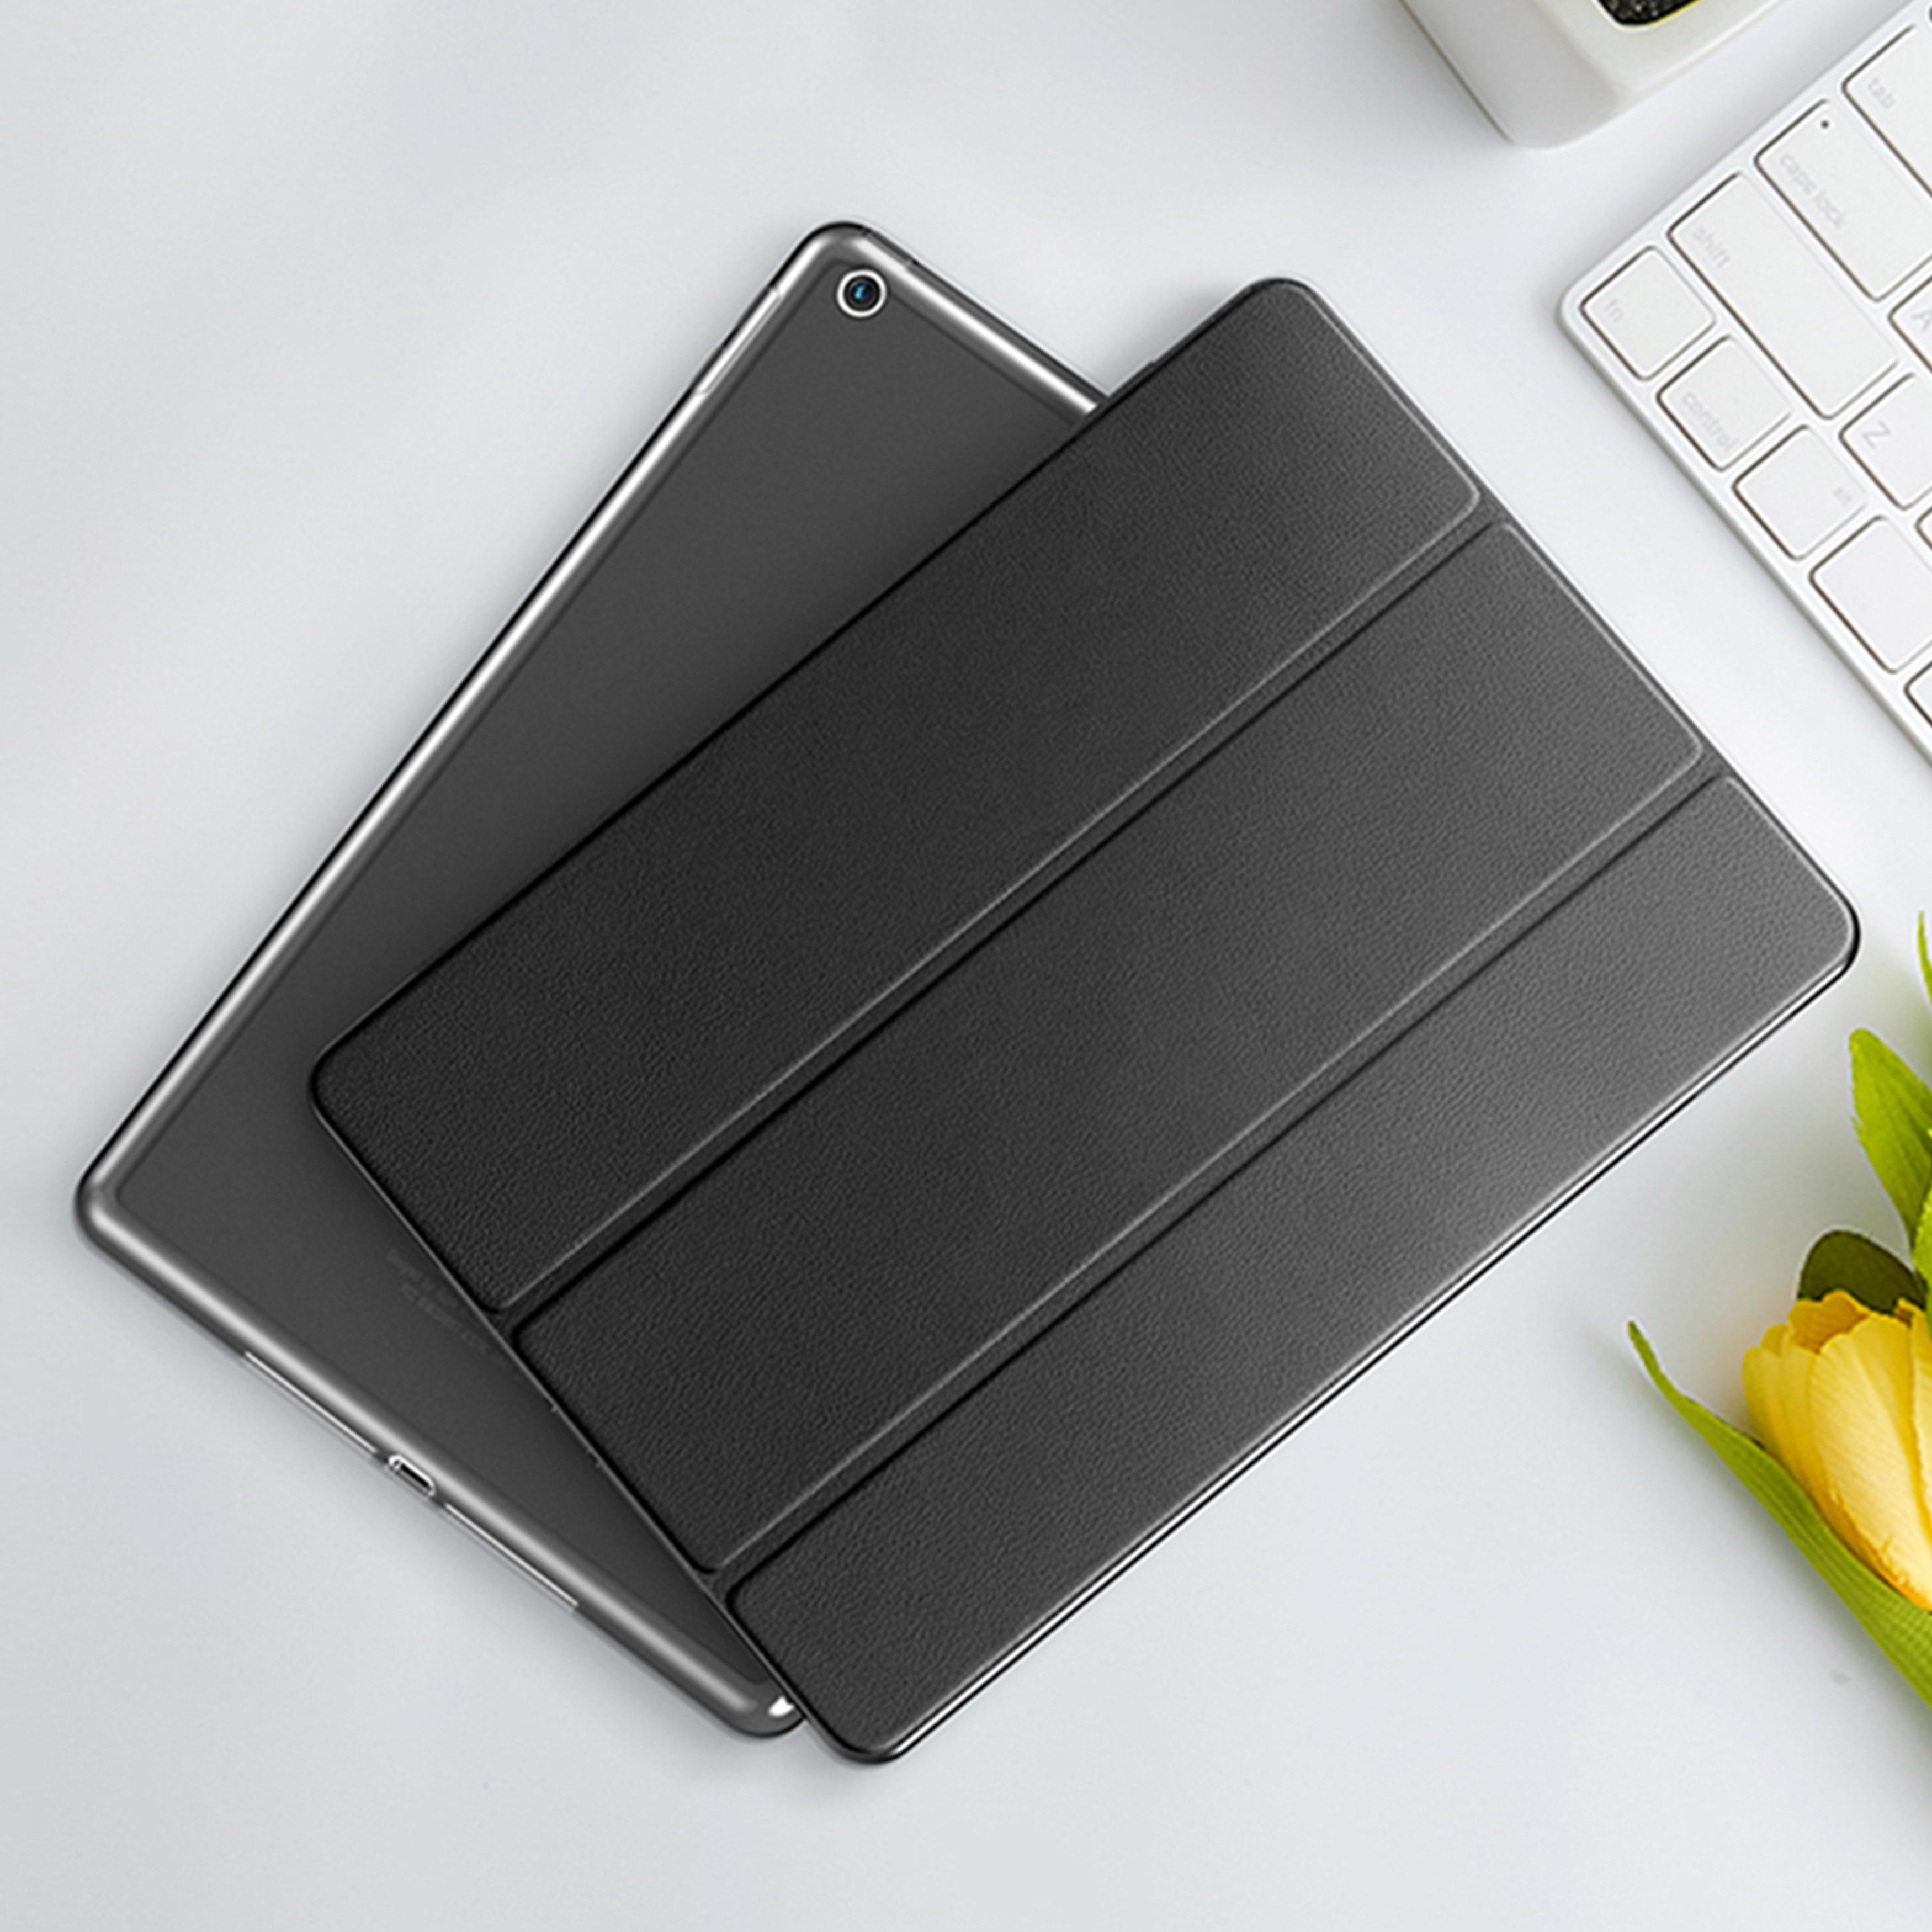 Чехол для huawei MediaPad T3 10 AGS-WO9 AGS-L09, 9,6 дюймов, Магнитный смарт-чехол для планшета Honor Play Pad 2, чехол-подставка